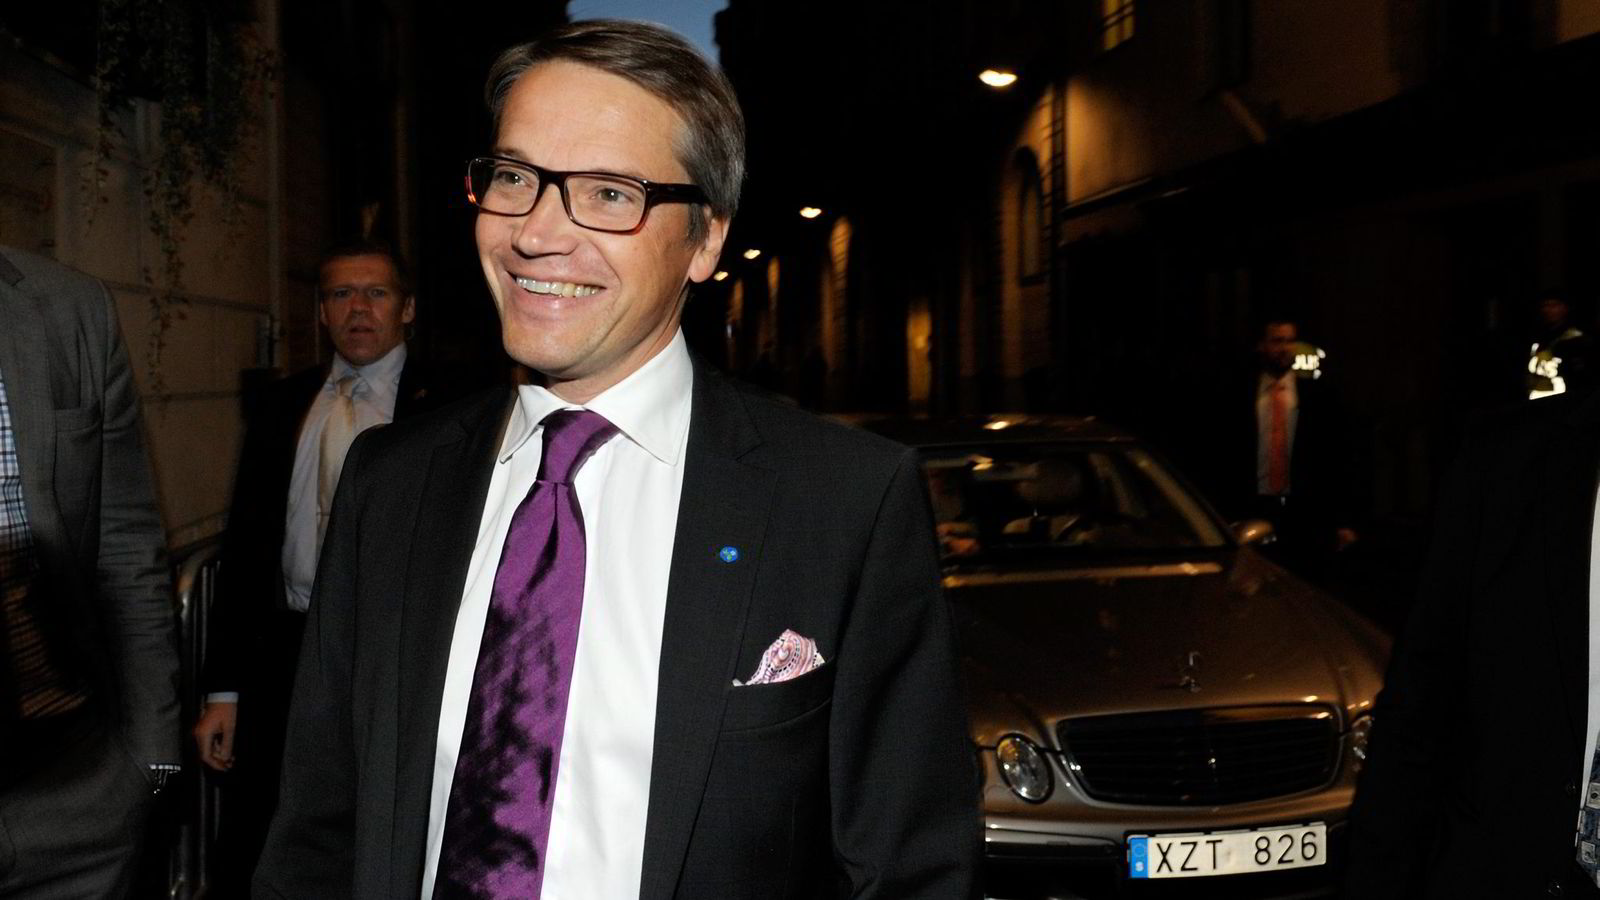 Torsdag varslet leder i Kristdemokraterna Göran Hägglund at han ønsker omlegging i integrasjonspolitikken. Foto: Jessica Gow/